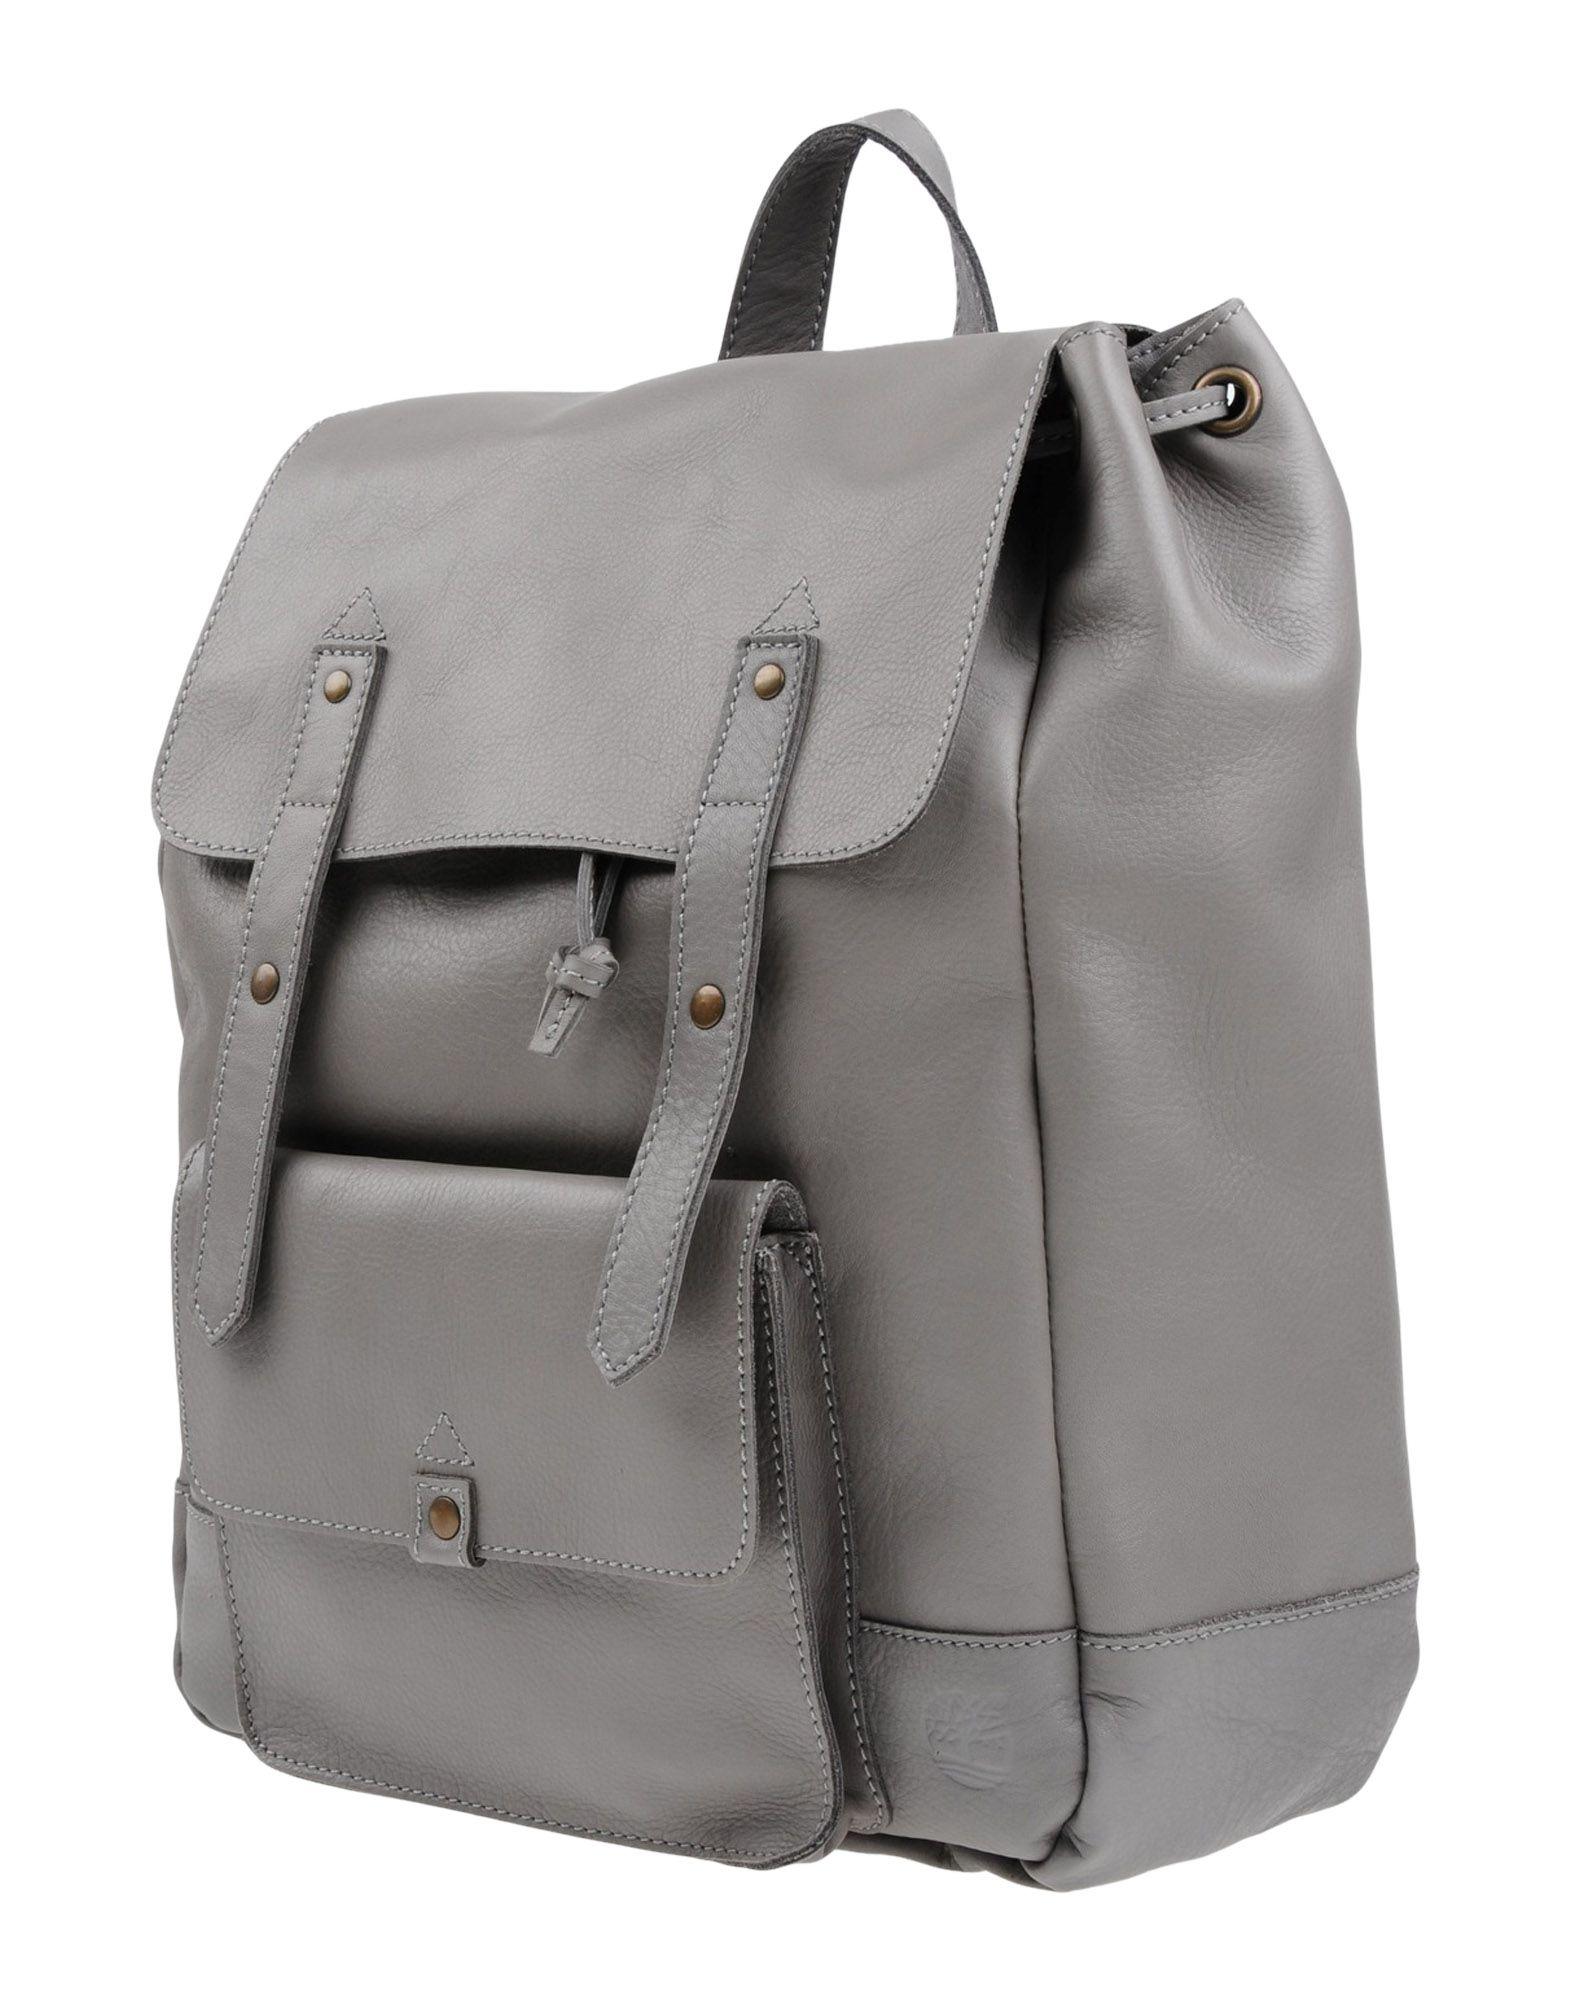 Ports 1961 HANDBAGS - Backpacks & Fanny packs su YOOX.COM dtetNxSf